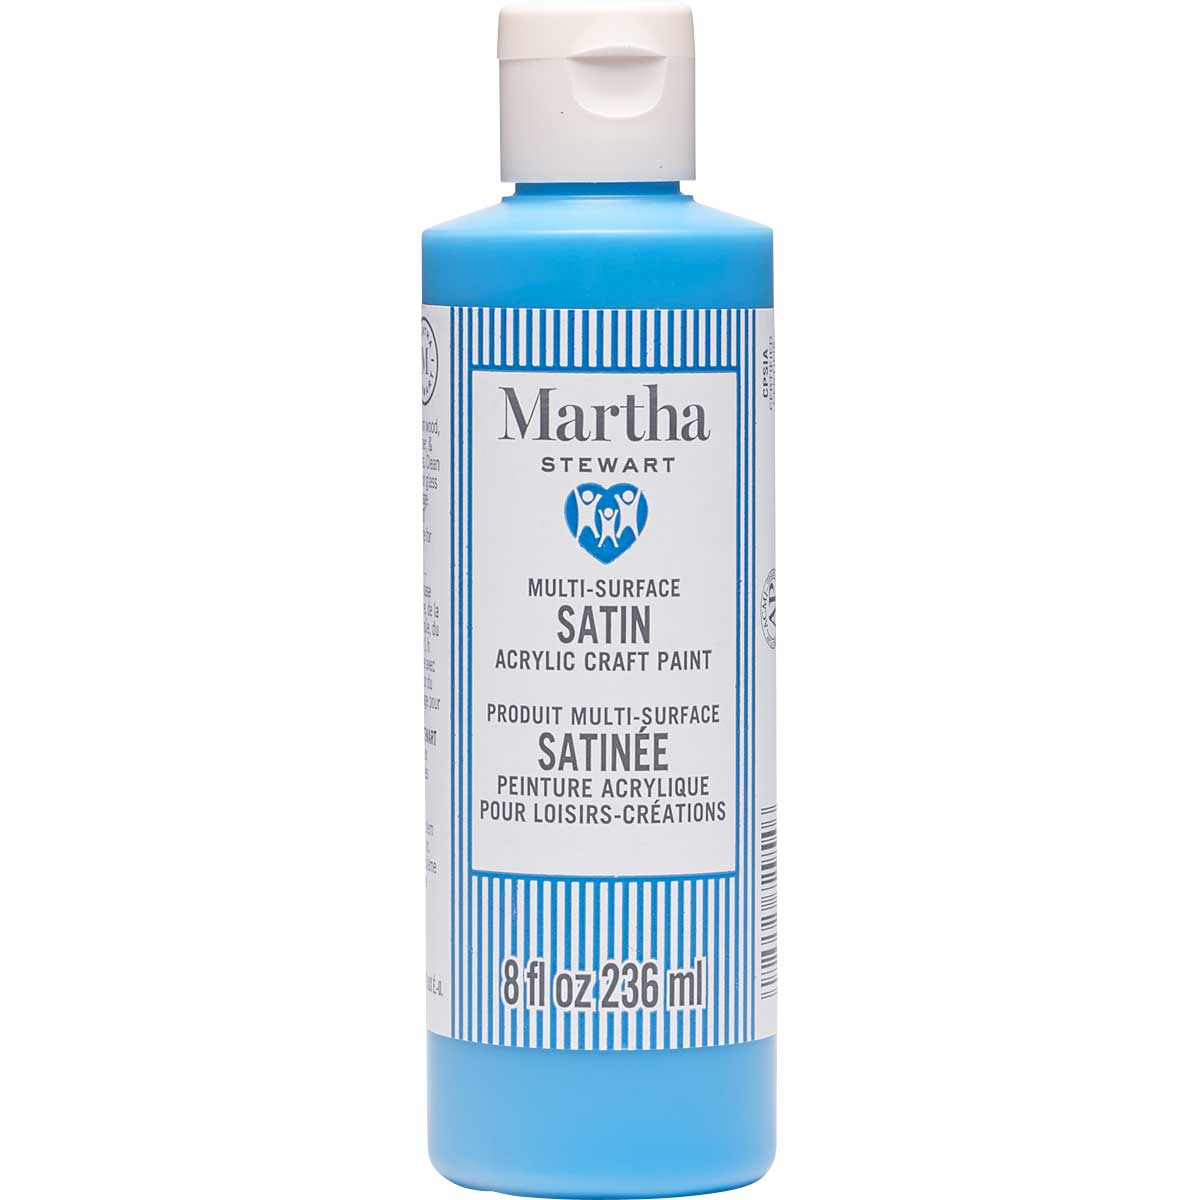 Martha Stewart® 8oz Multi-Surface Satin Acrylic Craft Paint - Fish Tank Blue